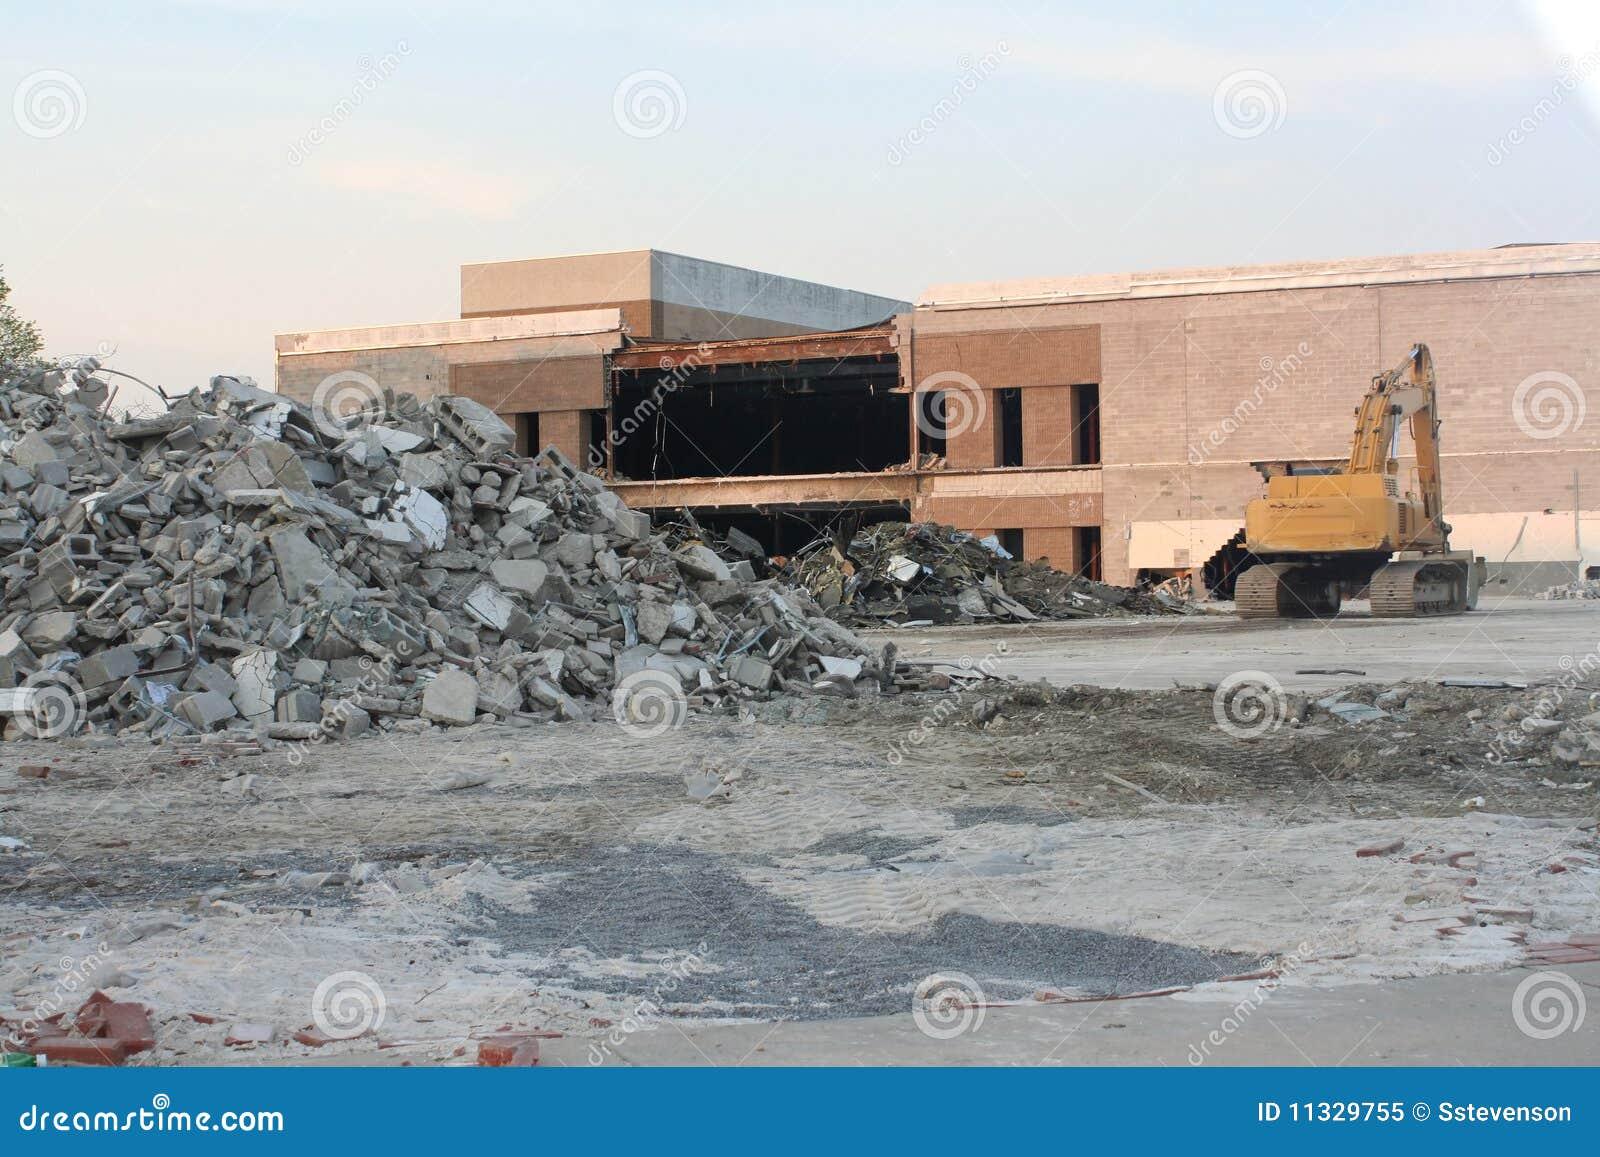 Royalty Free Stock Photo: Demolition Site: dreamstime.com/royalty-free-stock-photo-demolition-site-image11329755